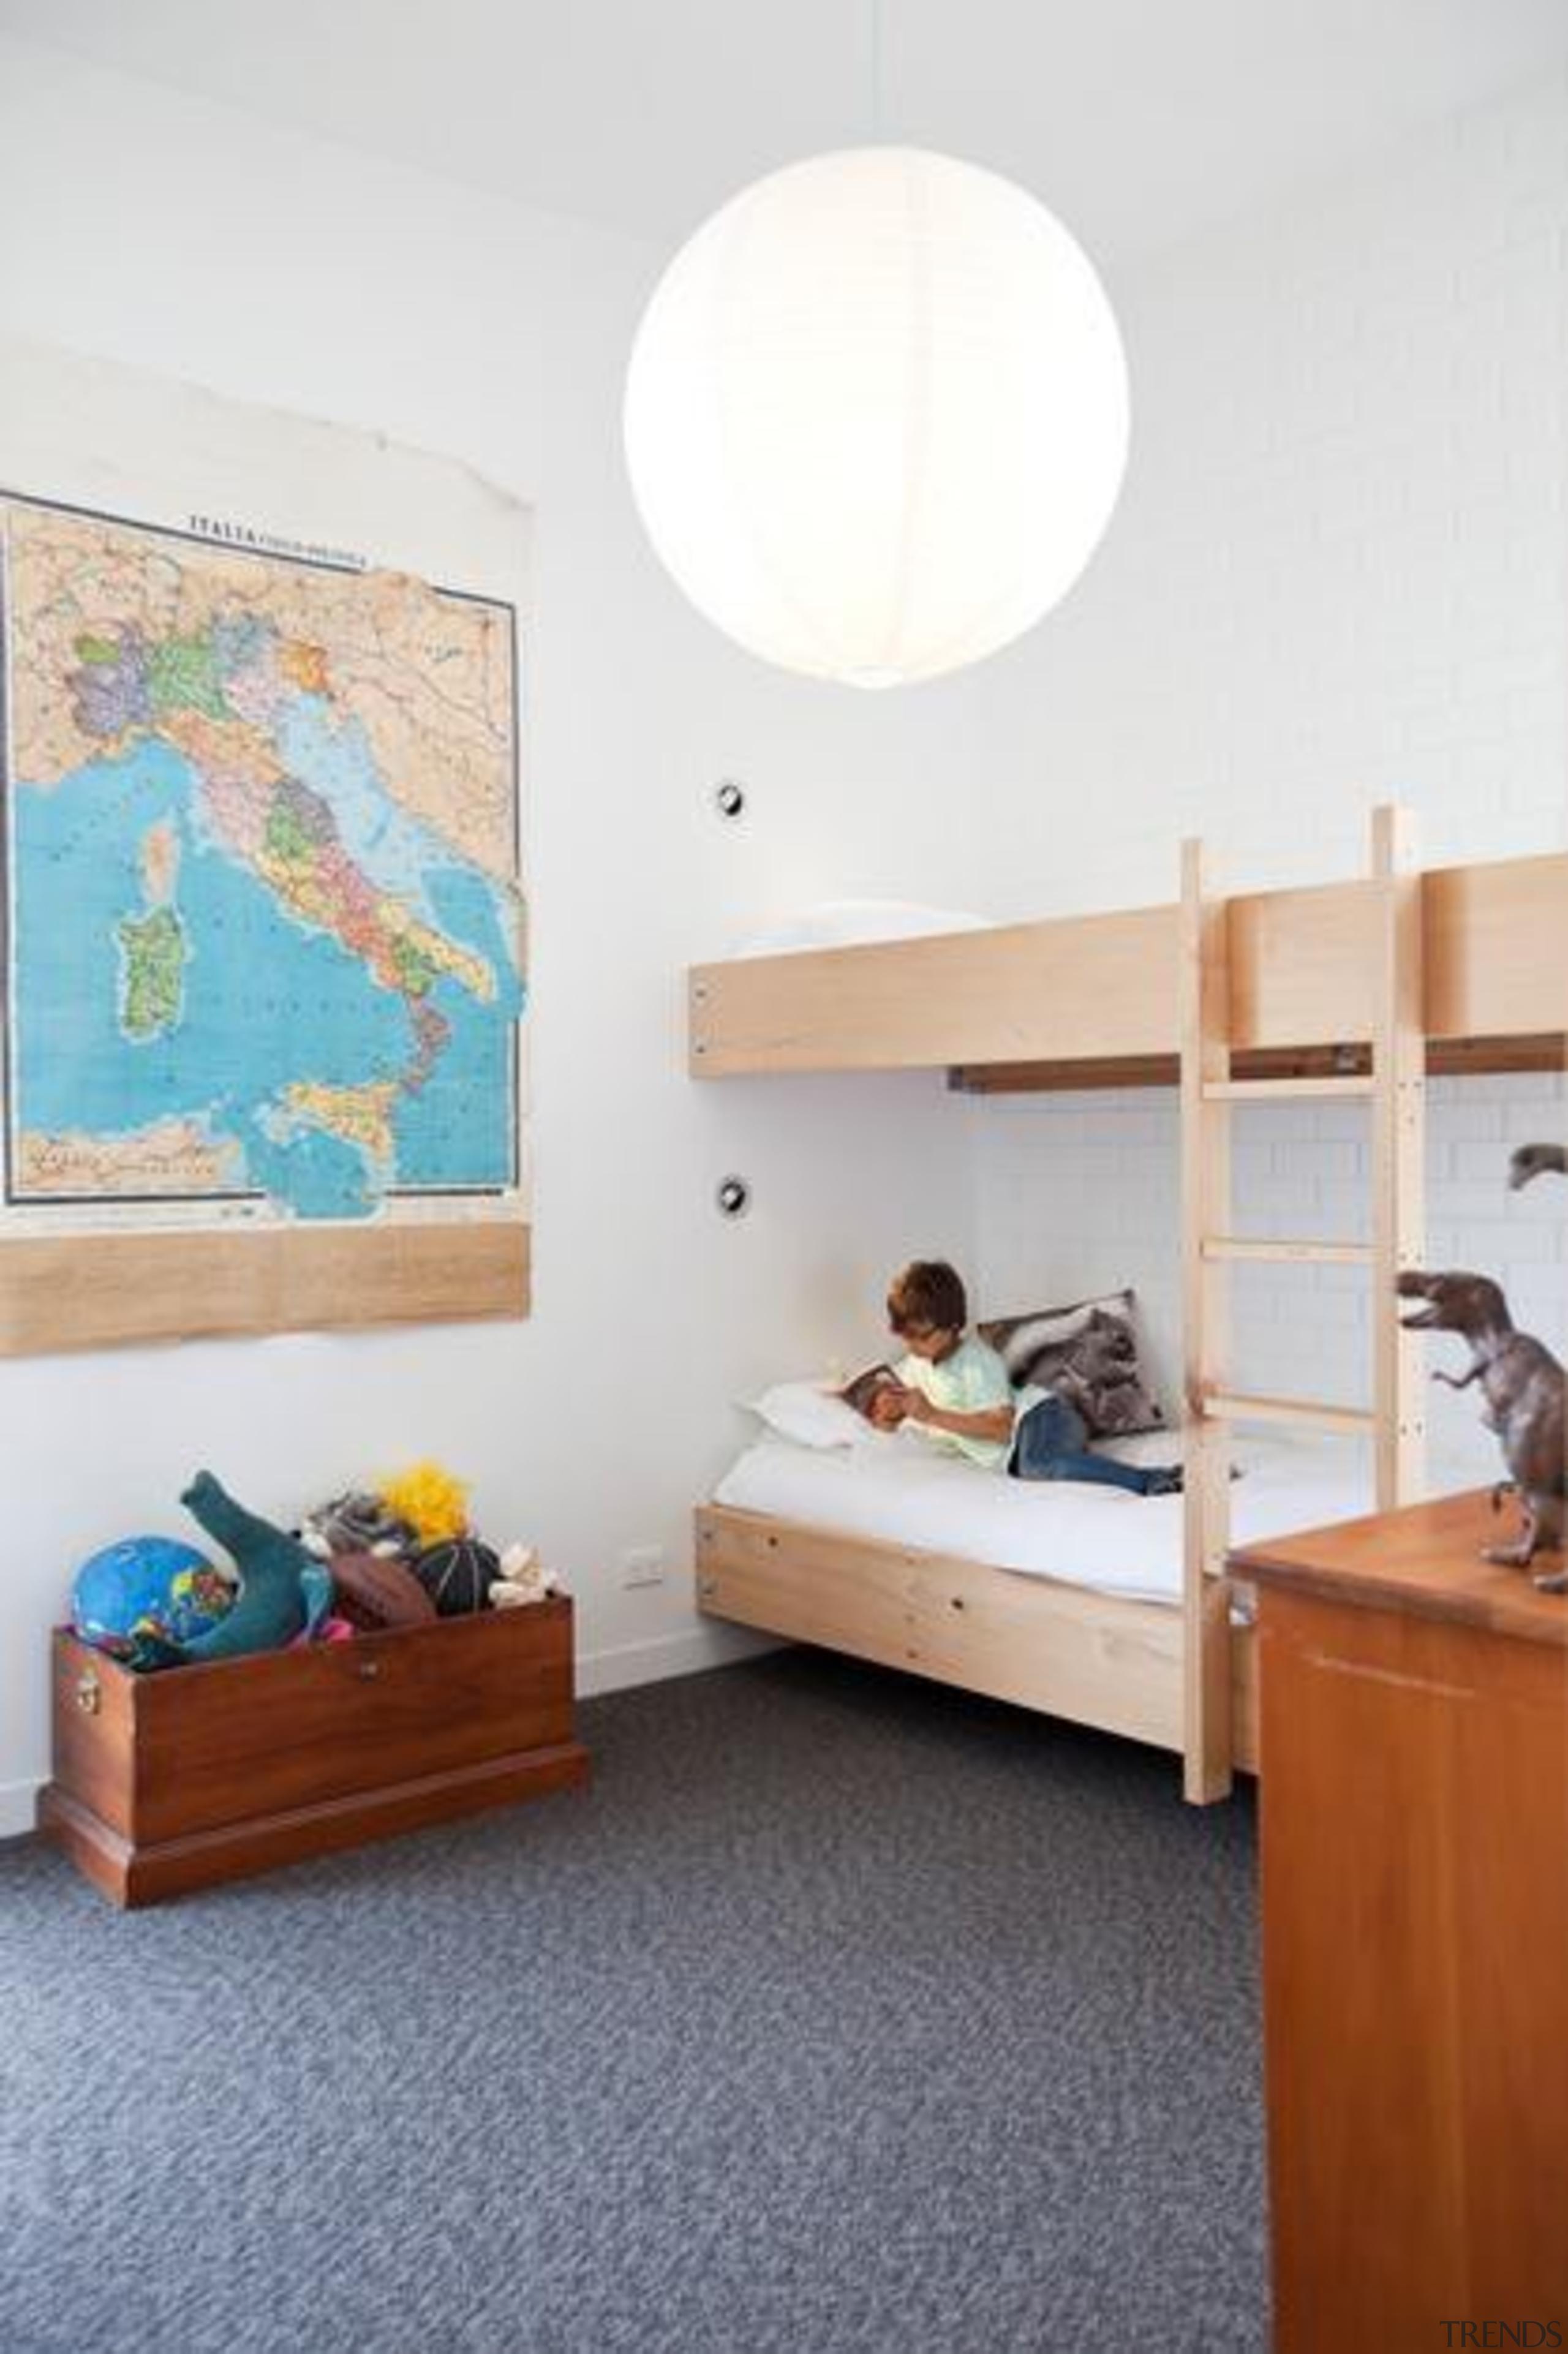 kids room - bed   bedroom   ceiling bed, bedroom, ceiling, floor, flooring, furniture, home, house, interior design, room, wall, white